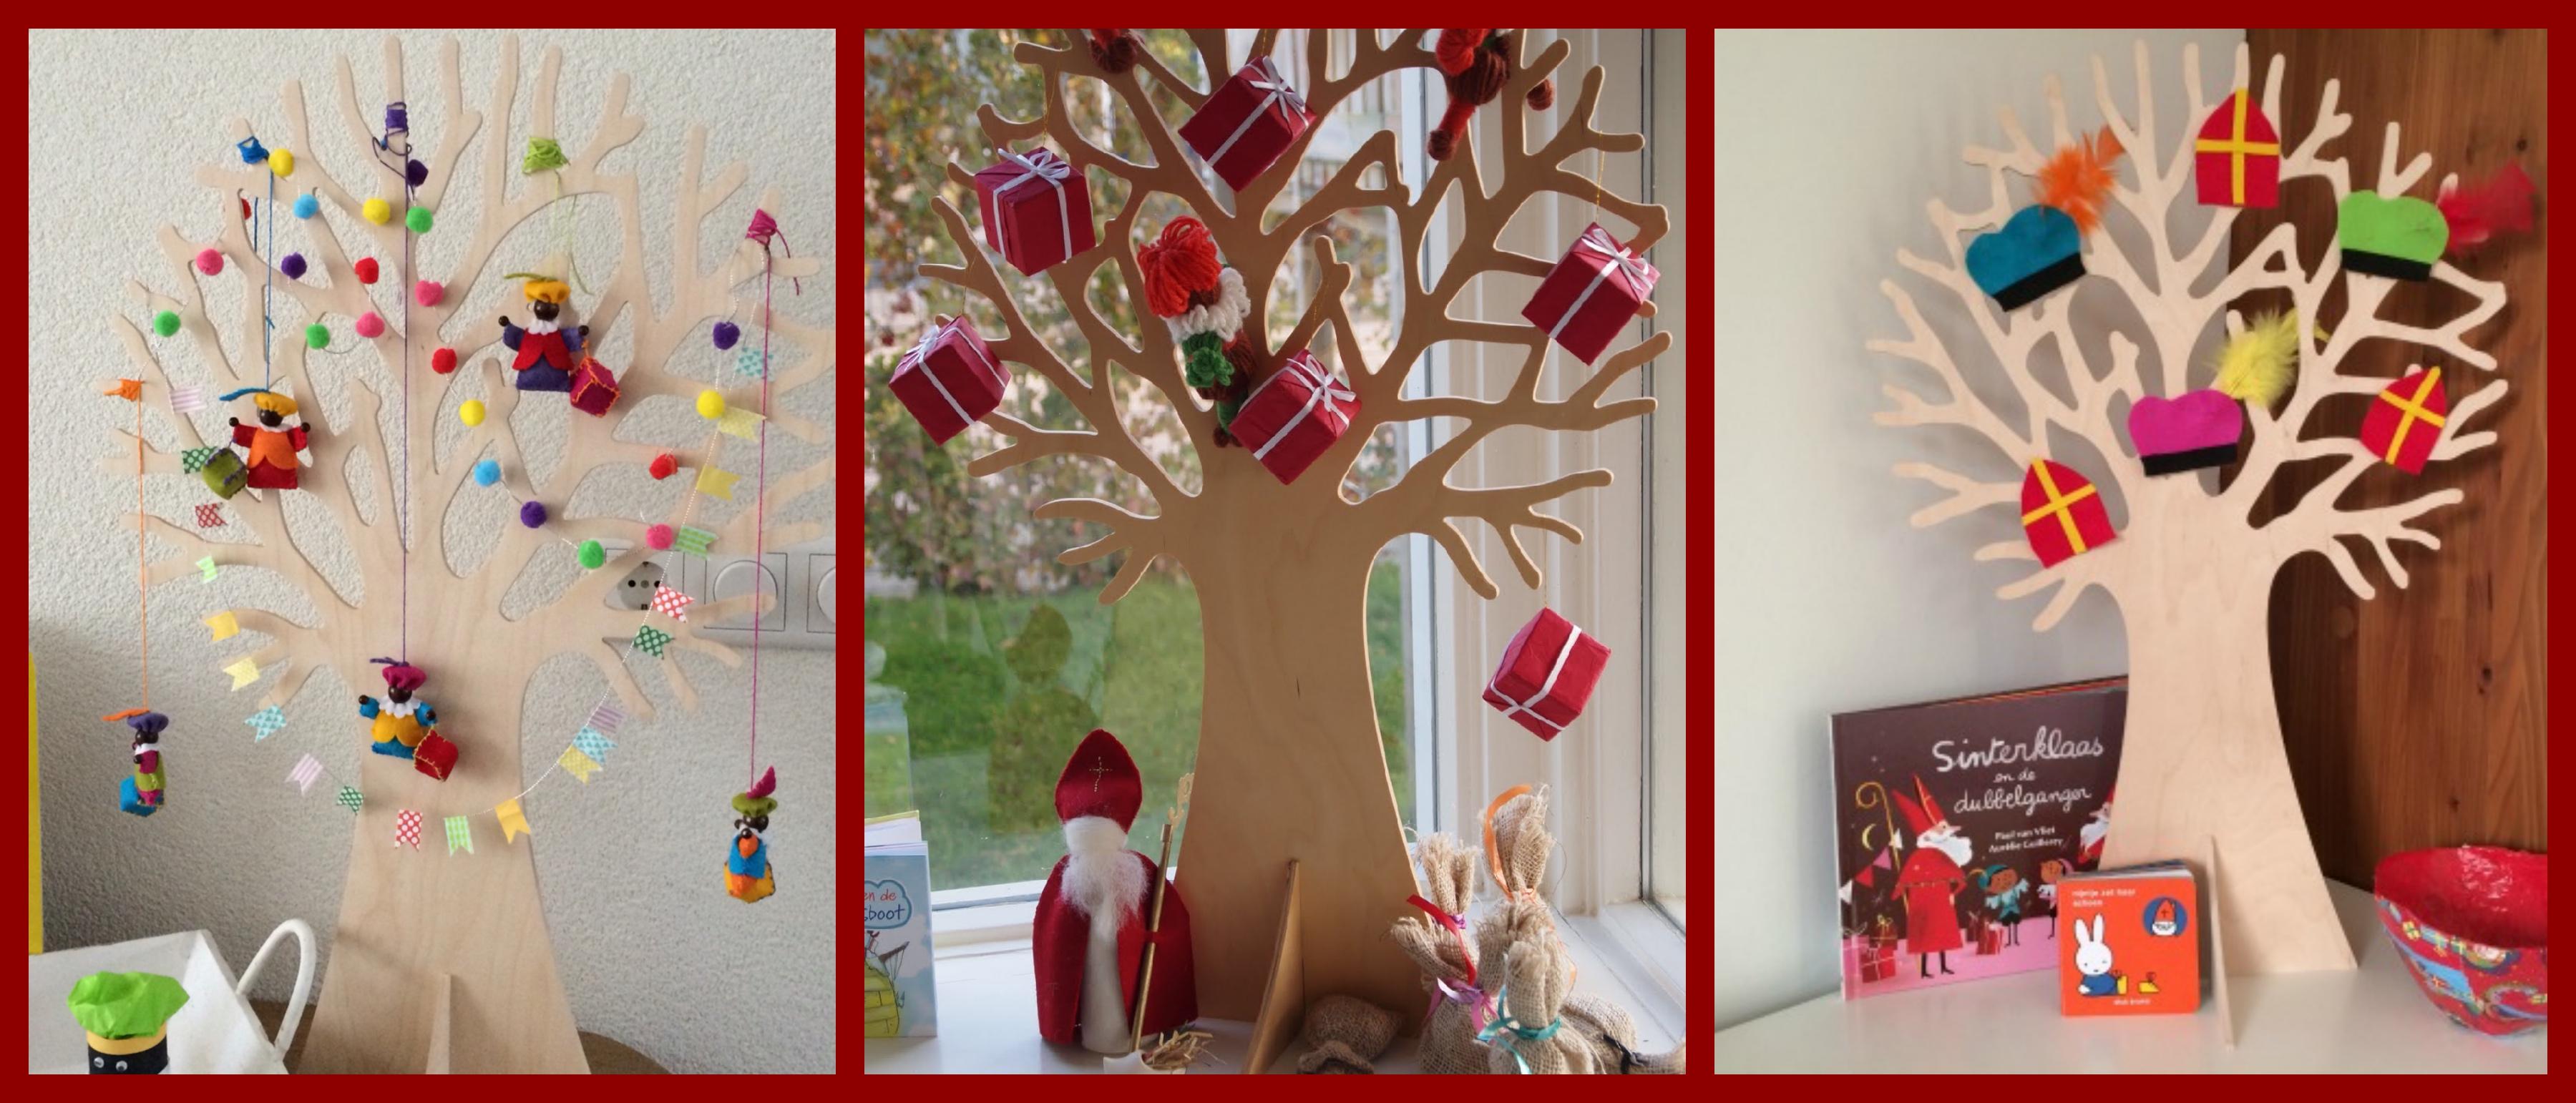 Sinterklaas seizoensboom